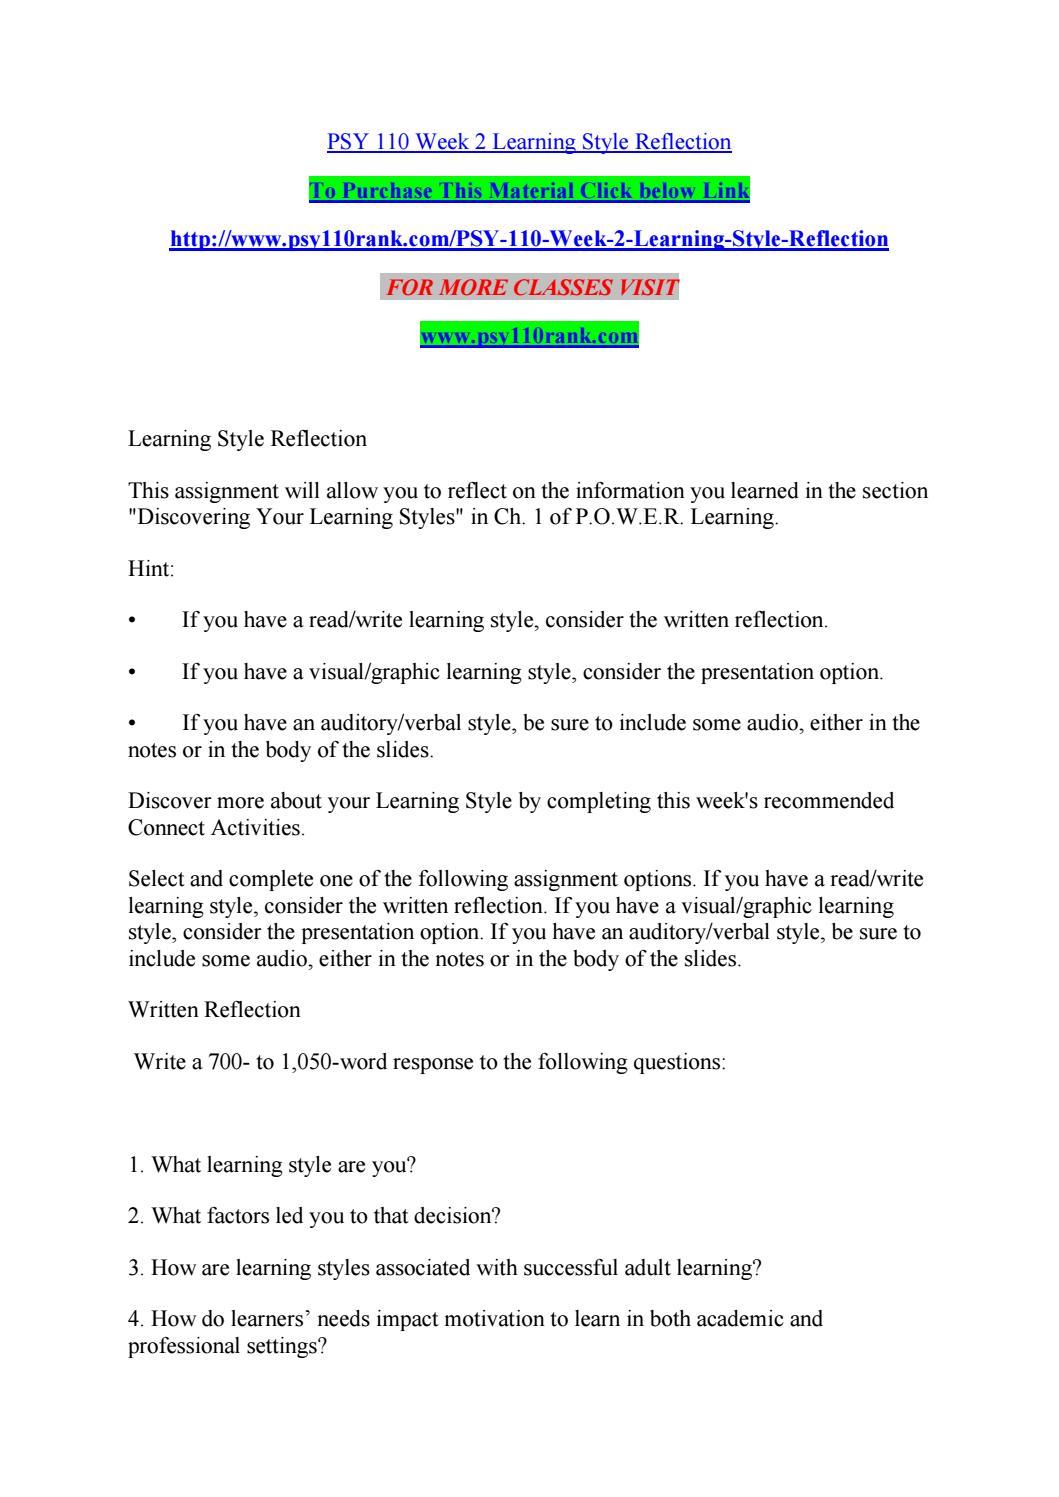 Psy 110 week 2 learning style reflection by chr.i.s.toferdavidjohnson -  issuu